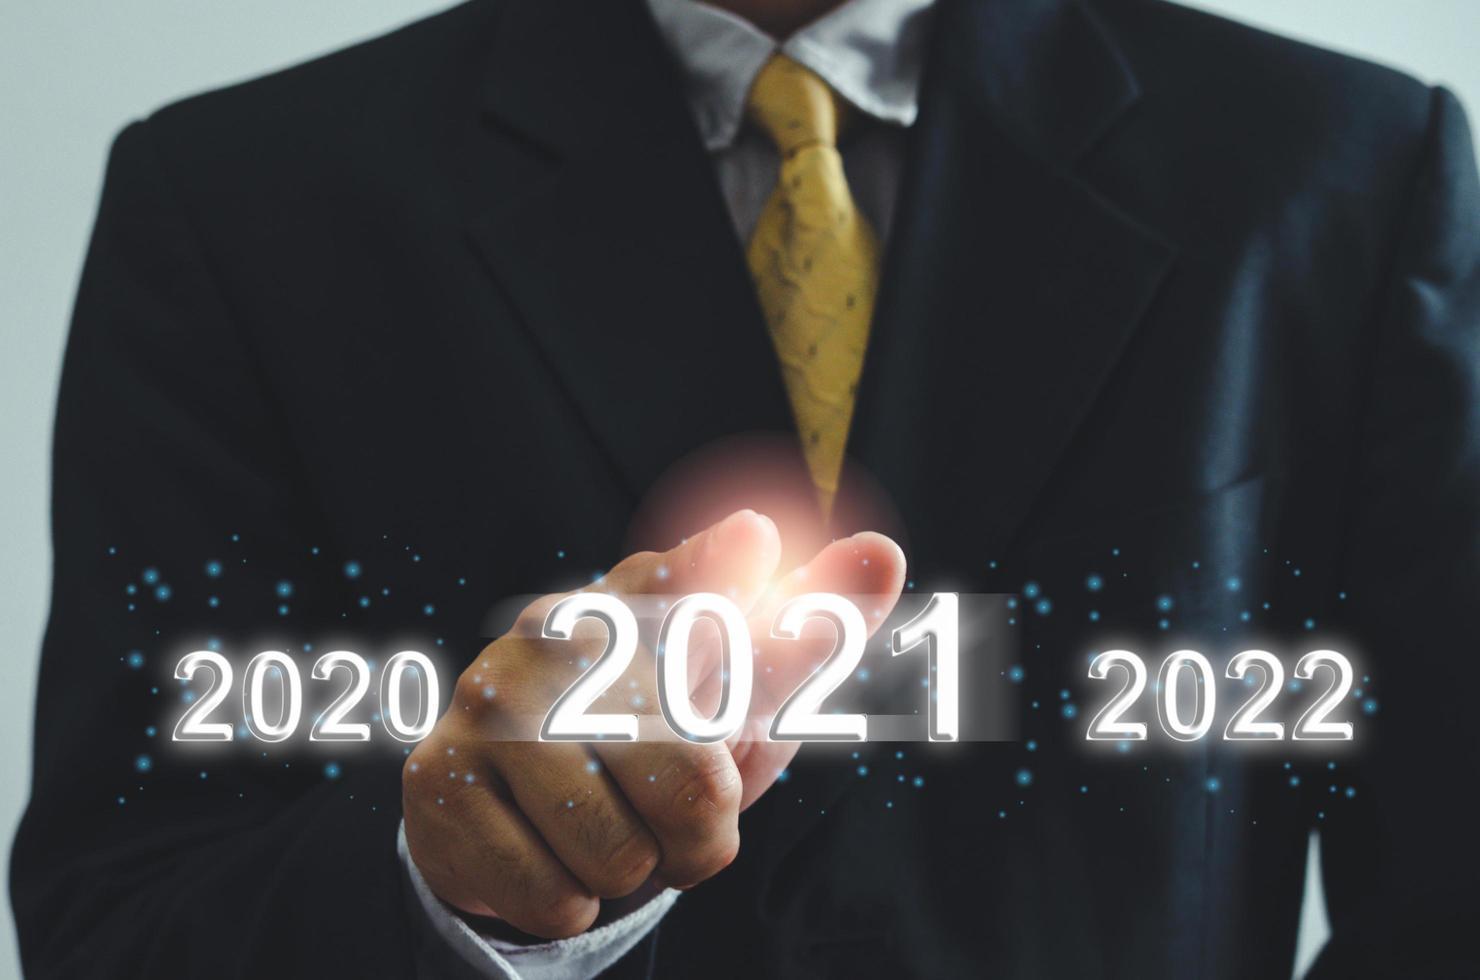 2021 business concept photo